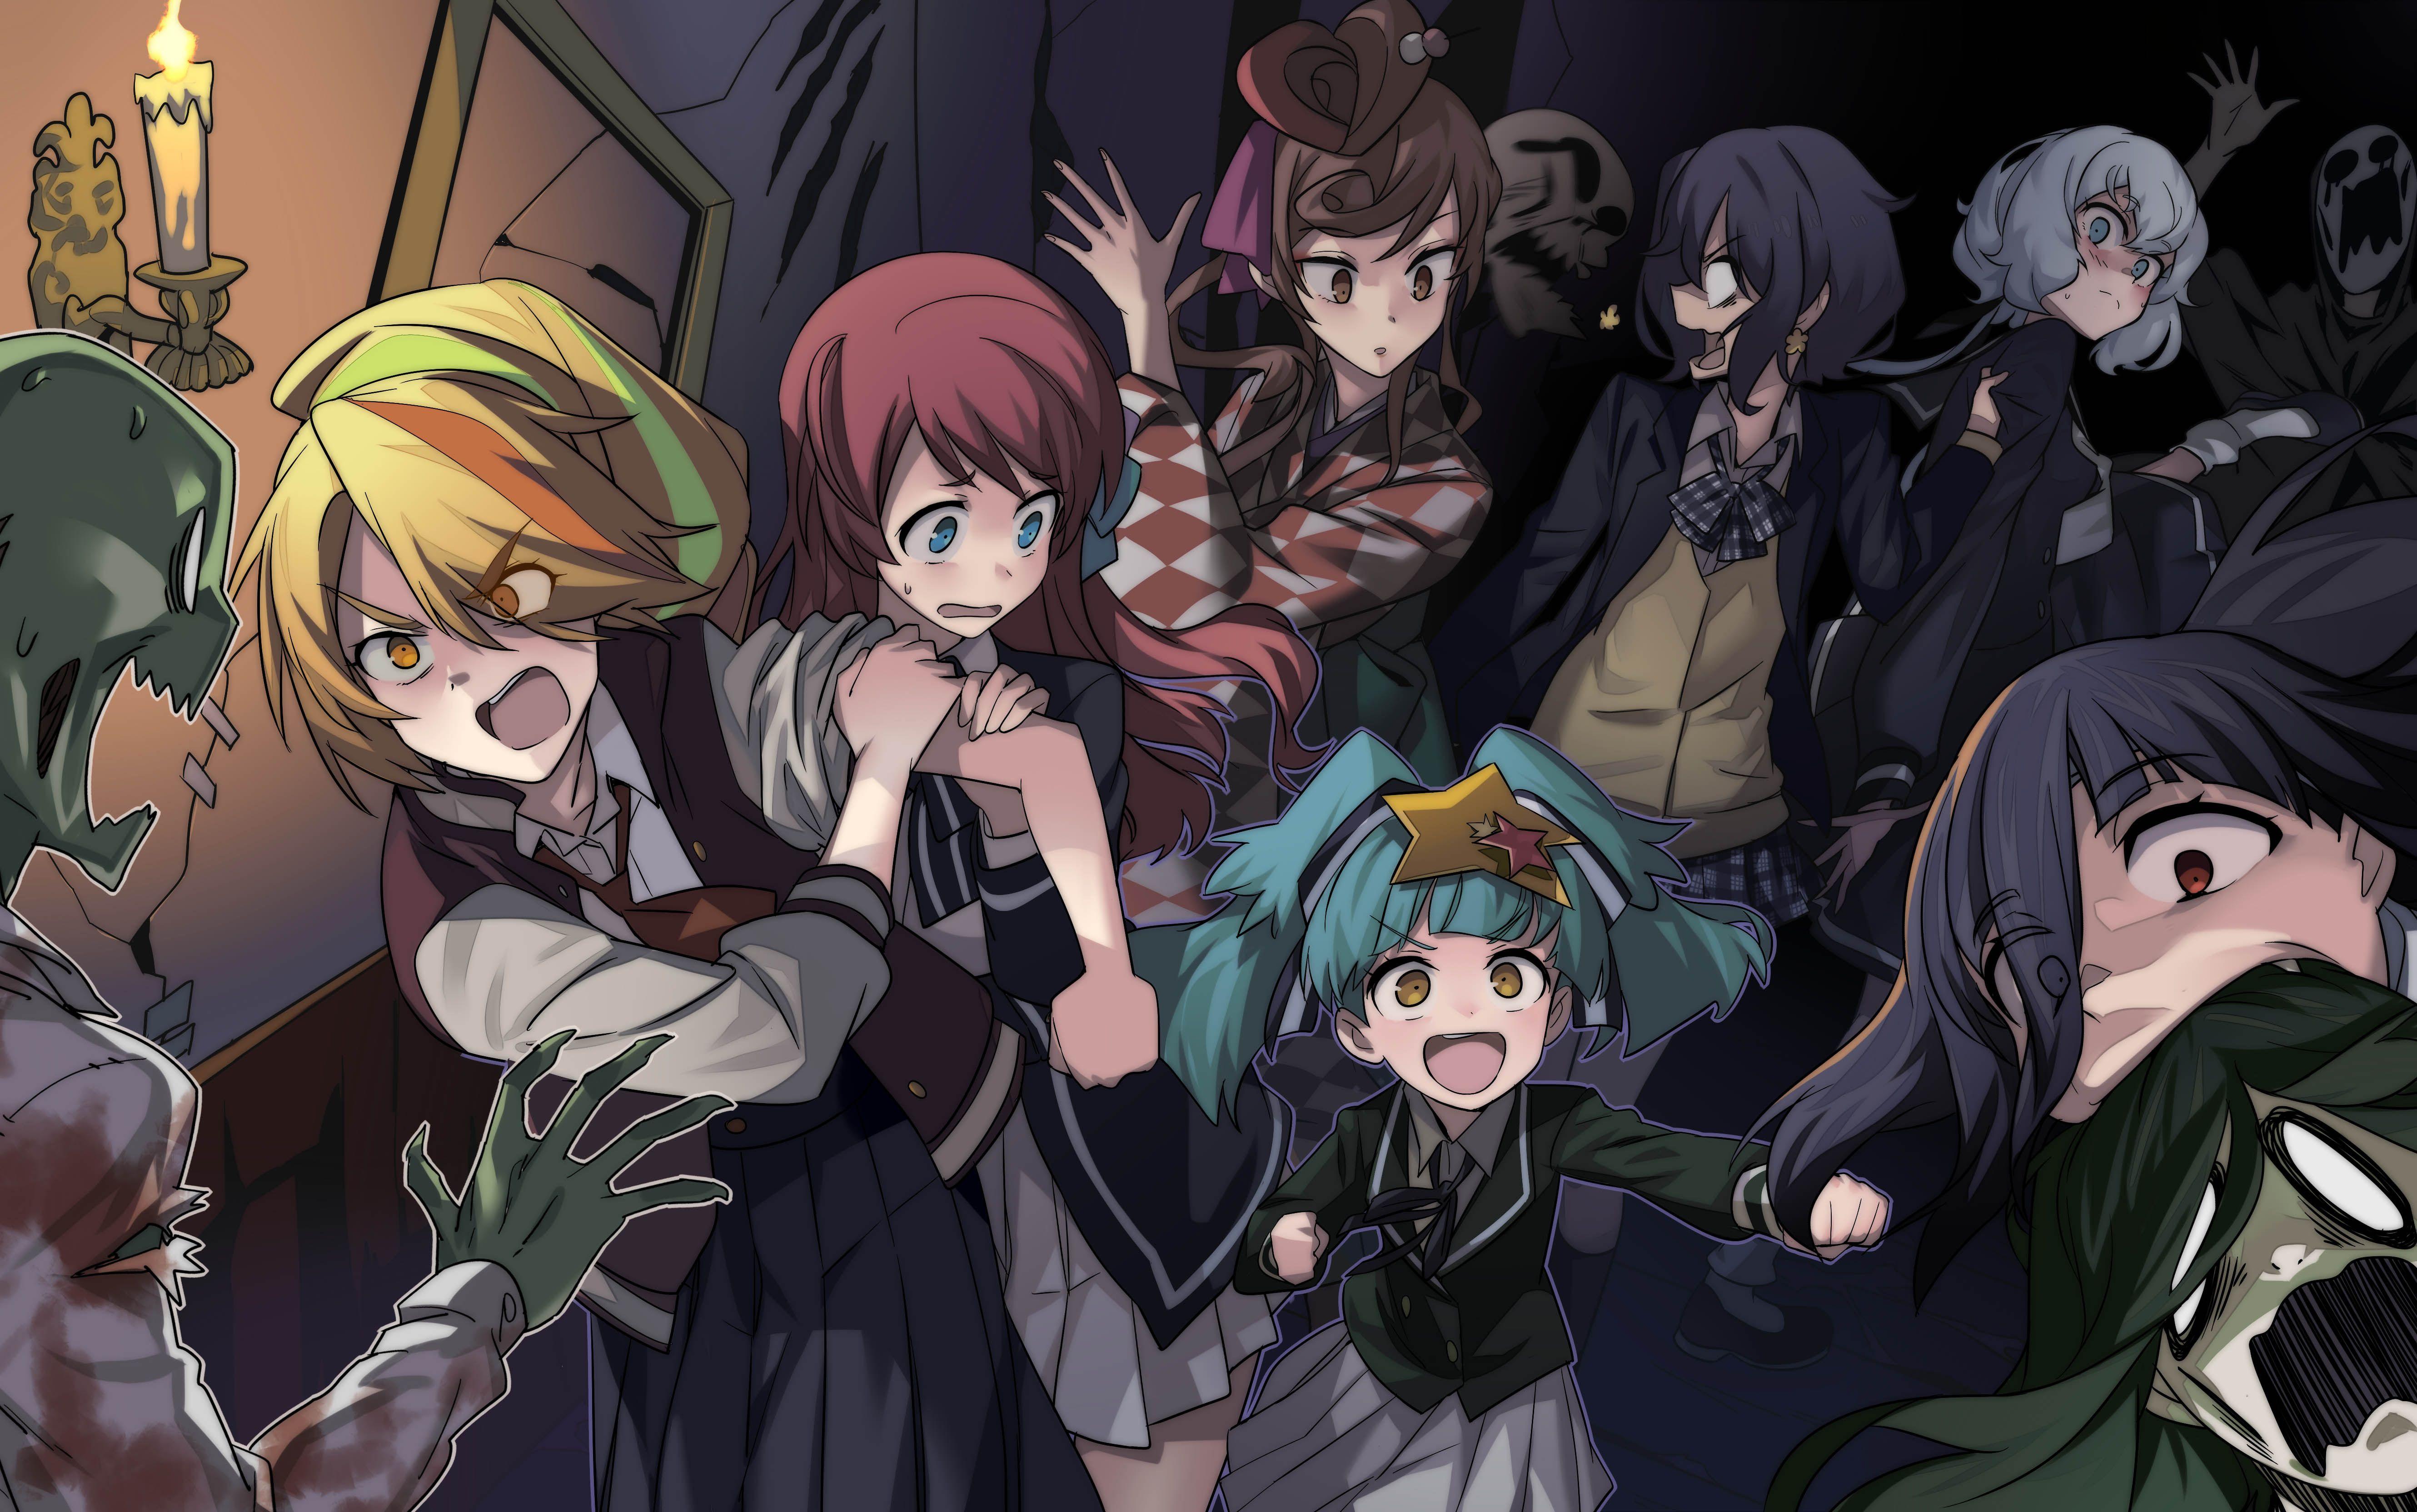 Pin By Ranpo Fangirl On Anime Wallpaper Pc Zombie Land Saga Anime Zombie